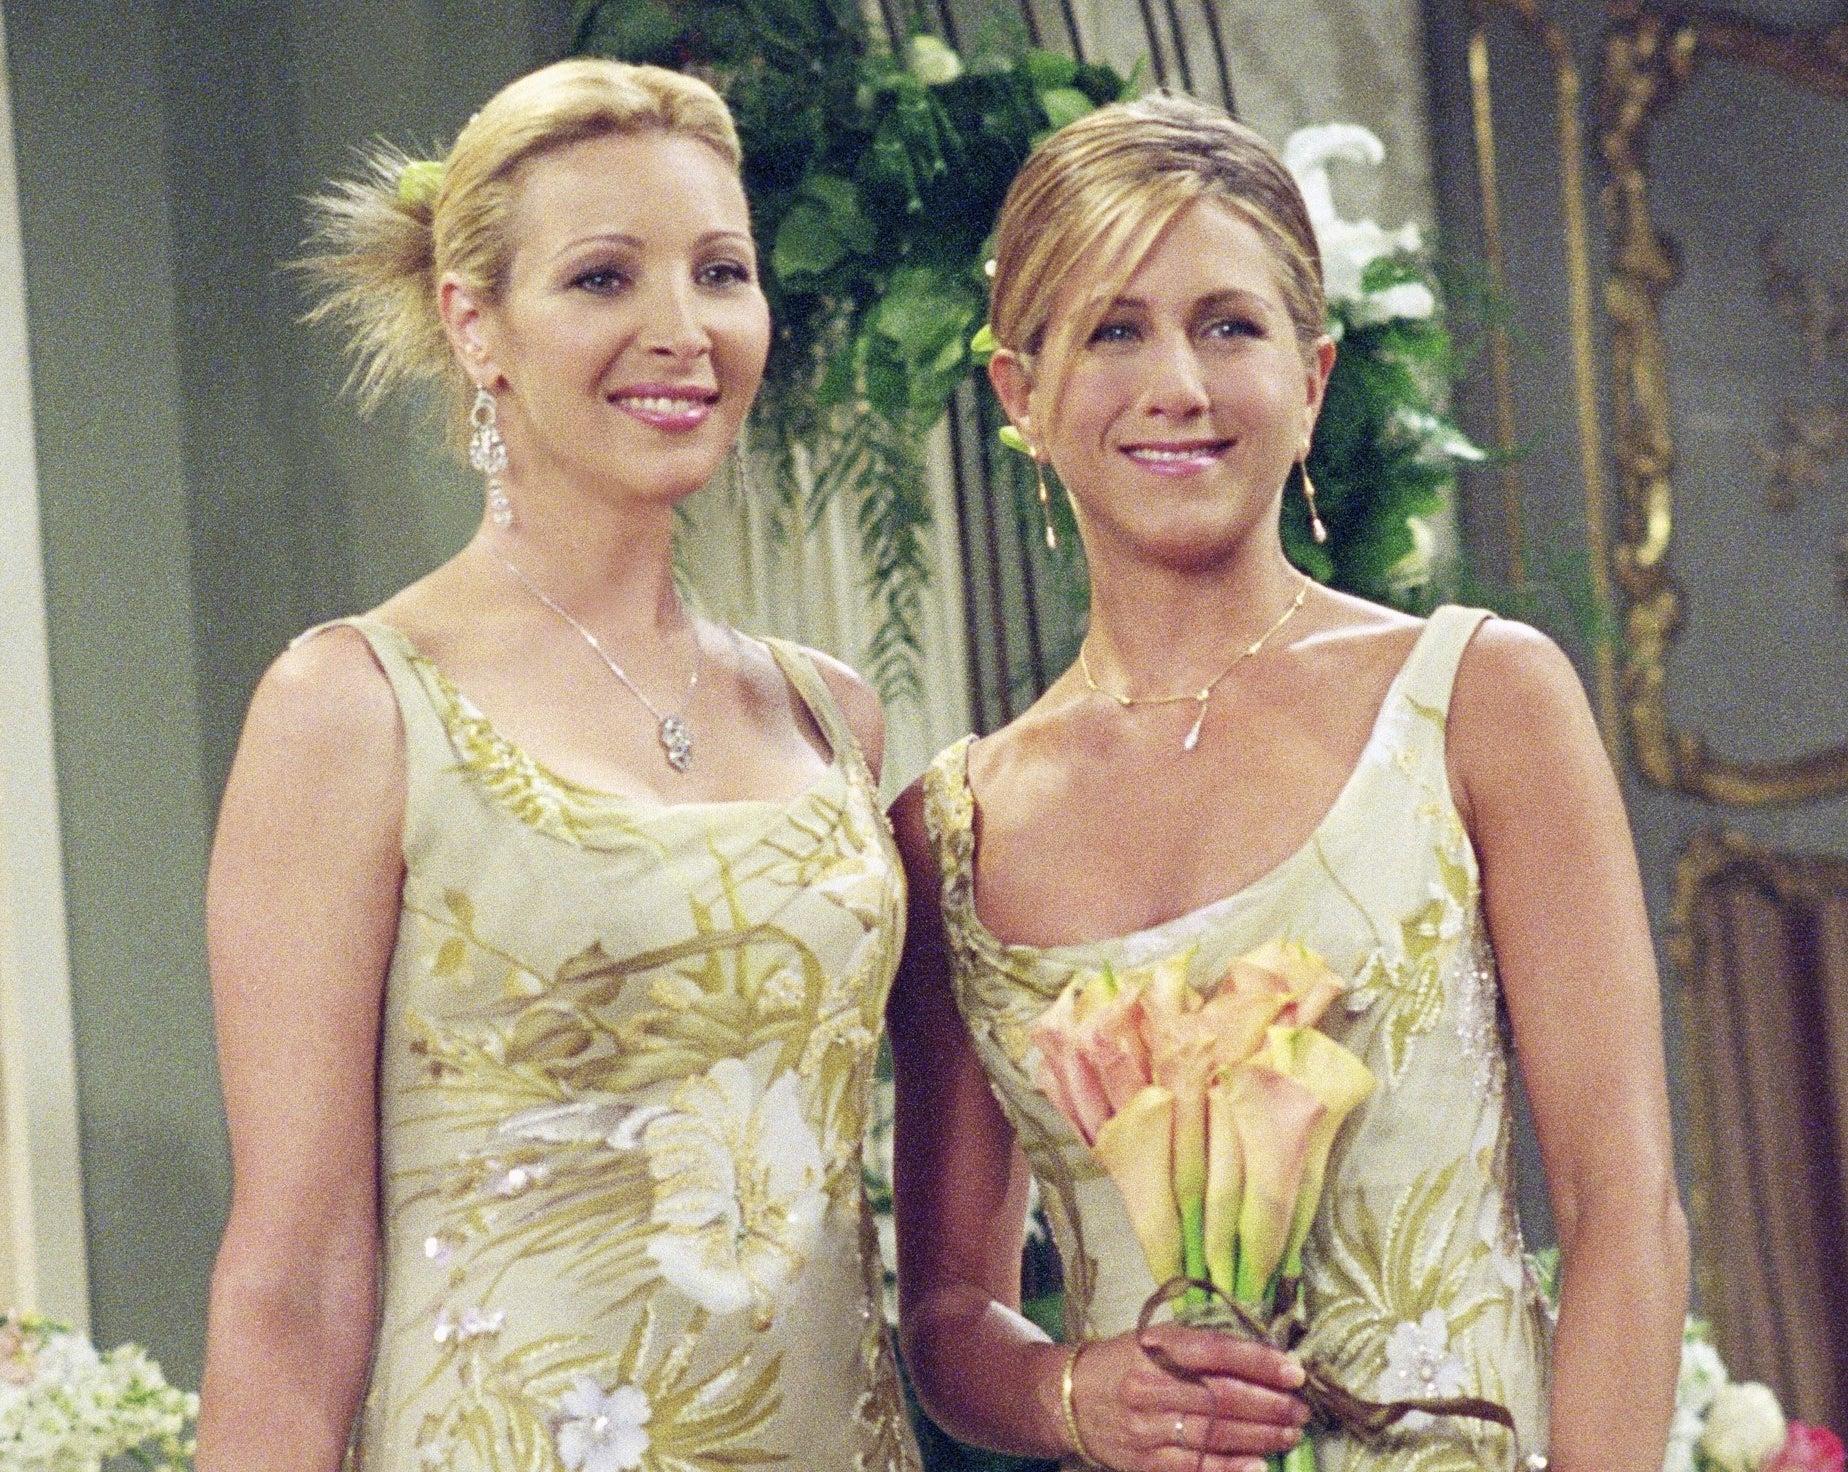 Jennifer and Lisa wear matching dresses on an episode of Friends